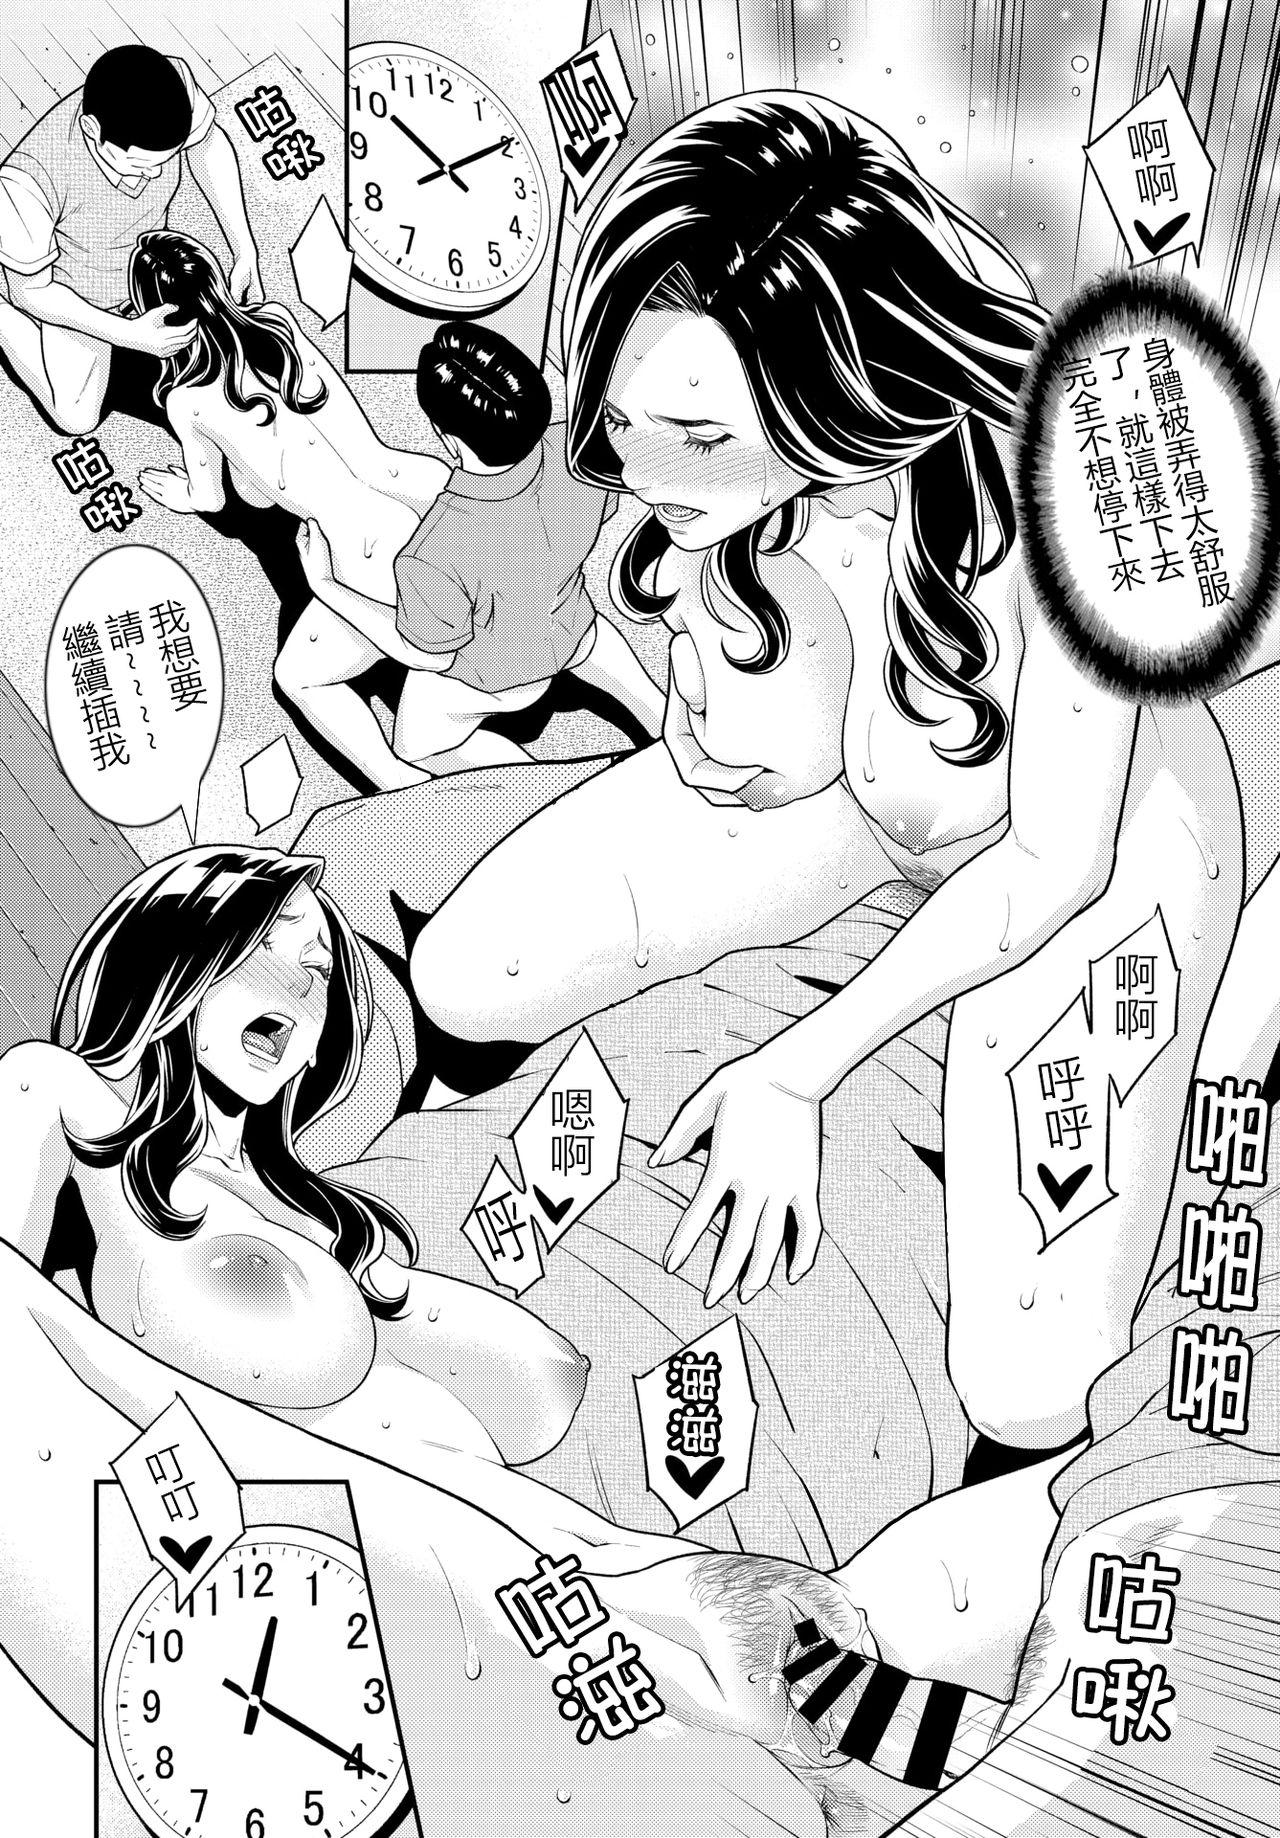 [Syuuen] Secret Wife  1-6 [Chinese][鼠灣漢化](210206最新修复完整版)【極品人妻NTR】 87